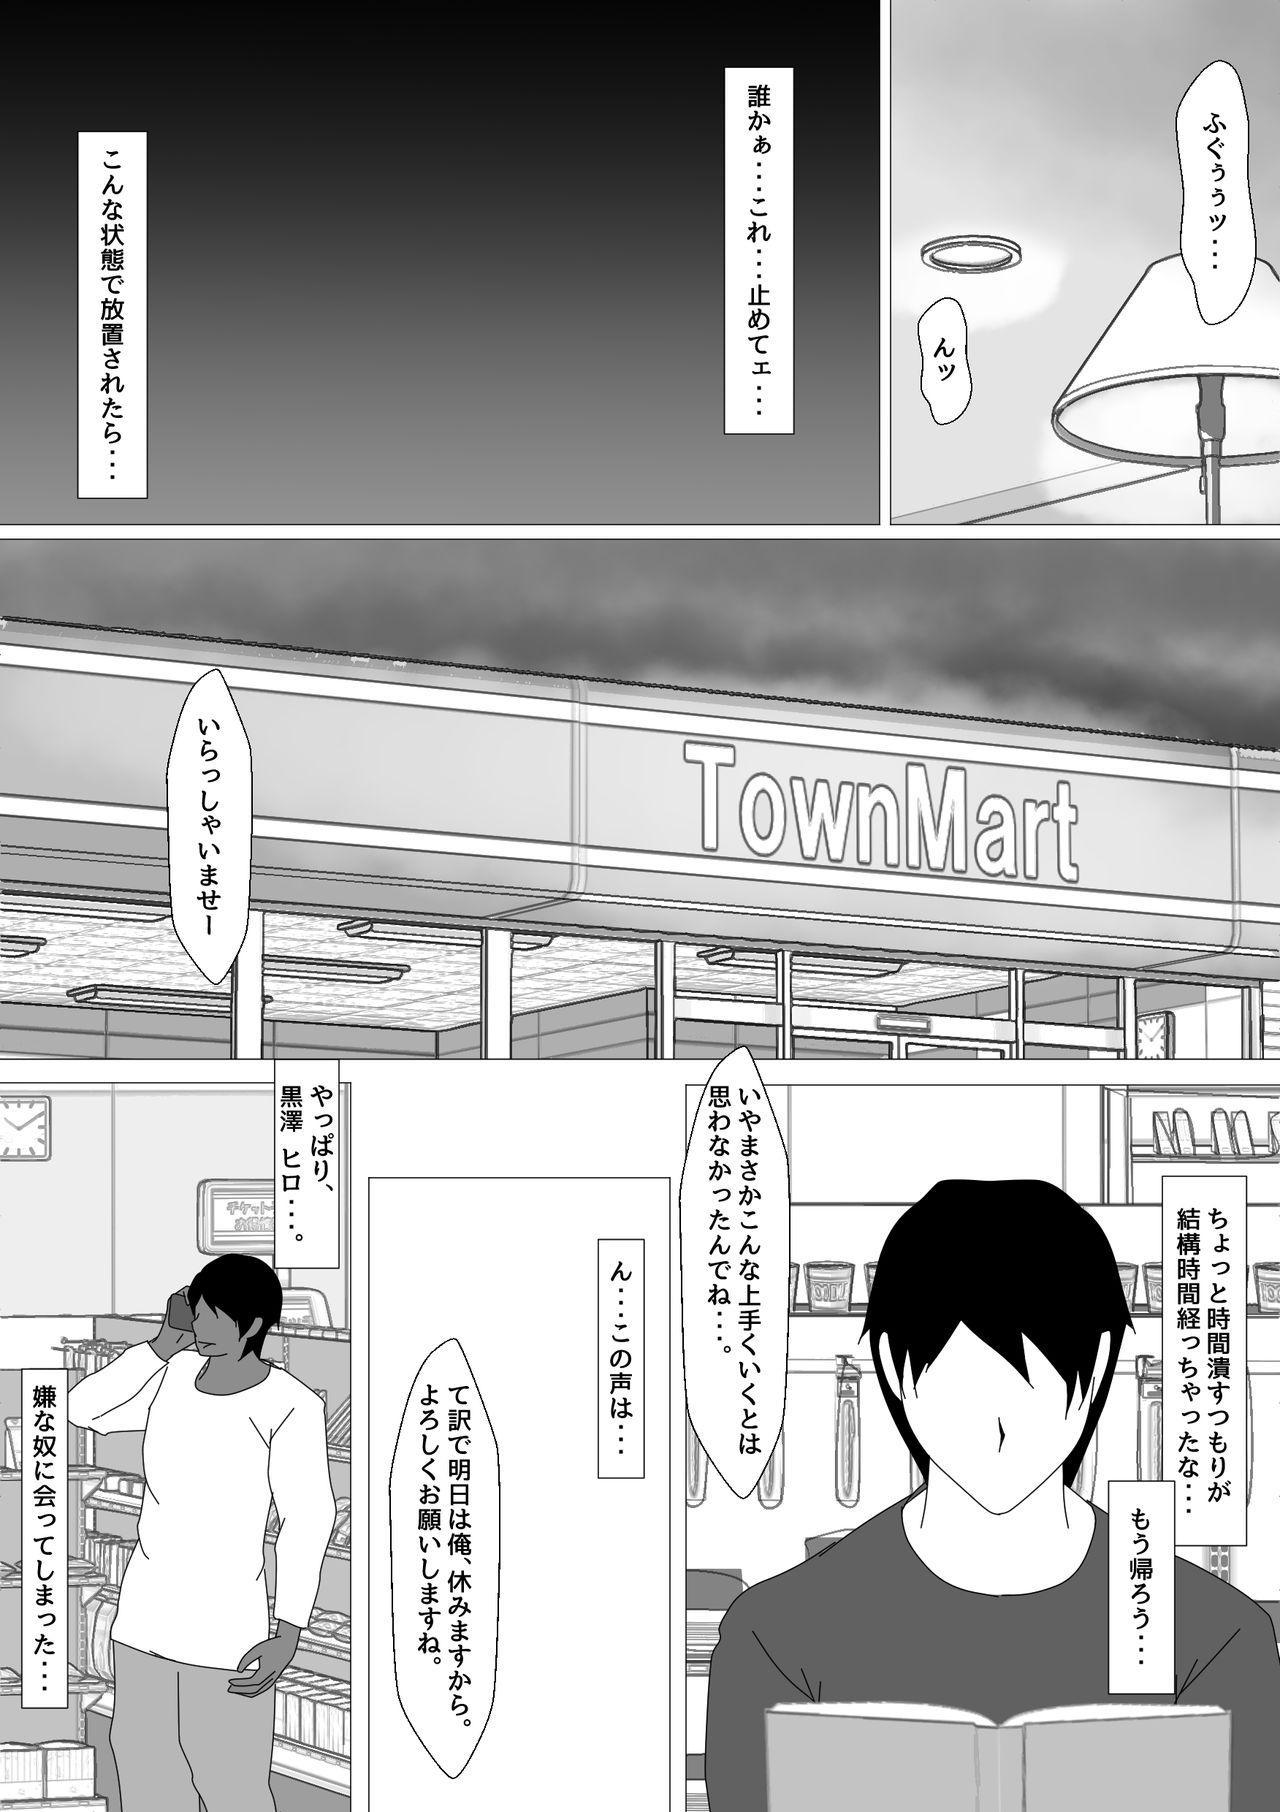 Jokyoushi Shinozaki Rin no Choukyou Kiroku Dai 2 | Female Teacher Rin Shinozaki's Training Record 2 32